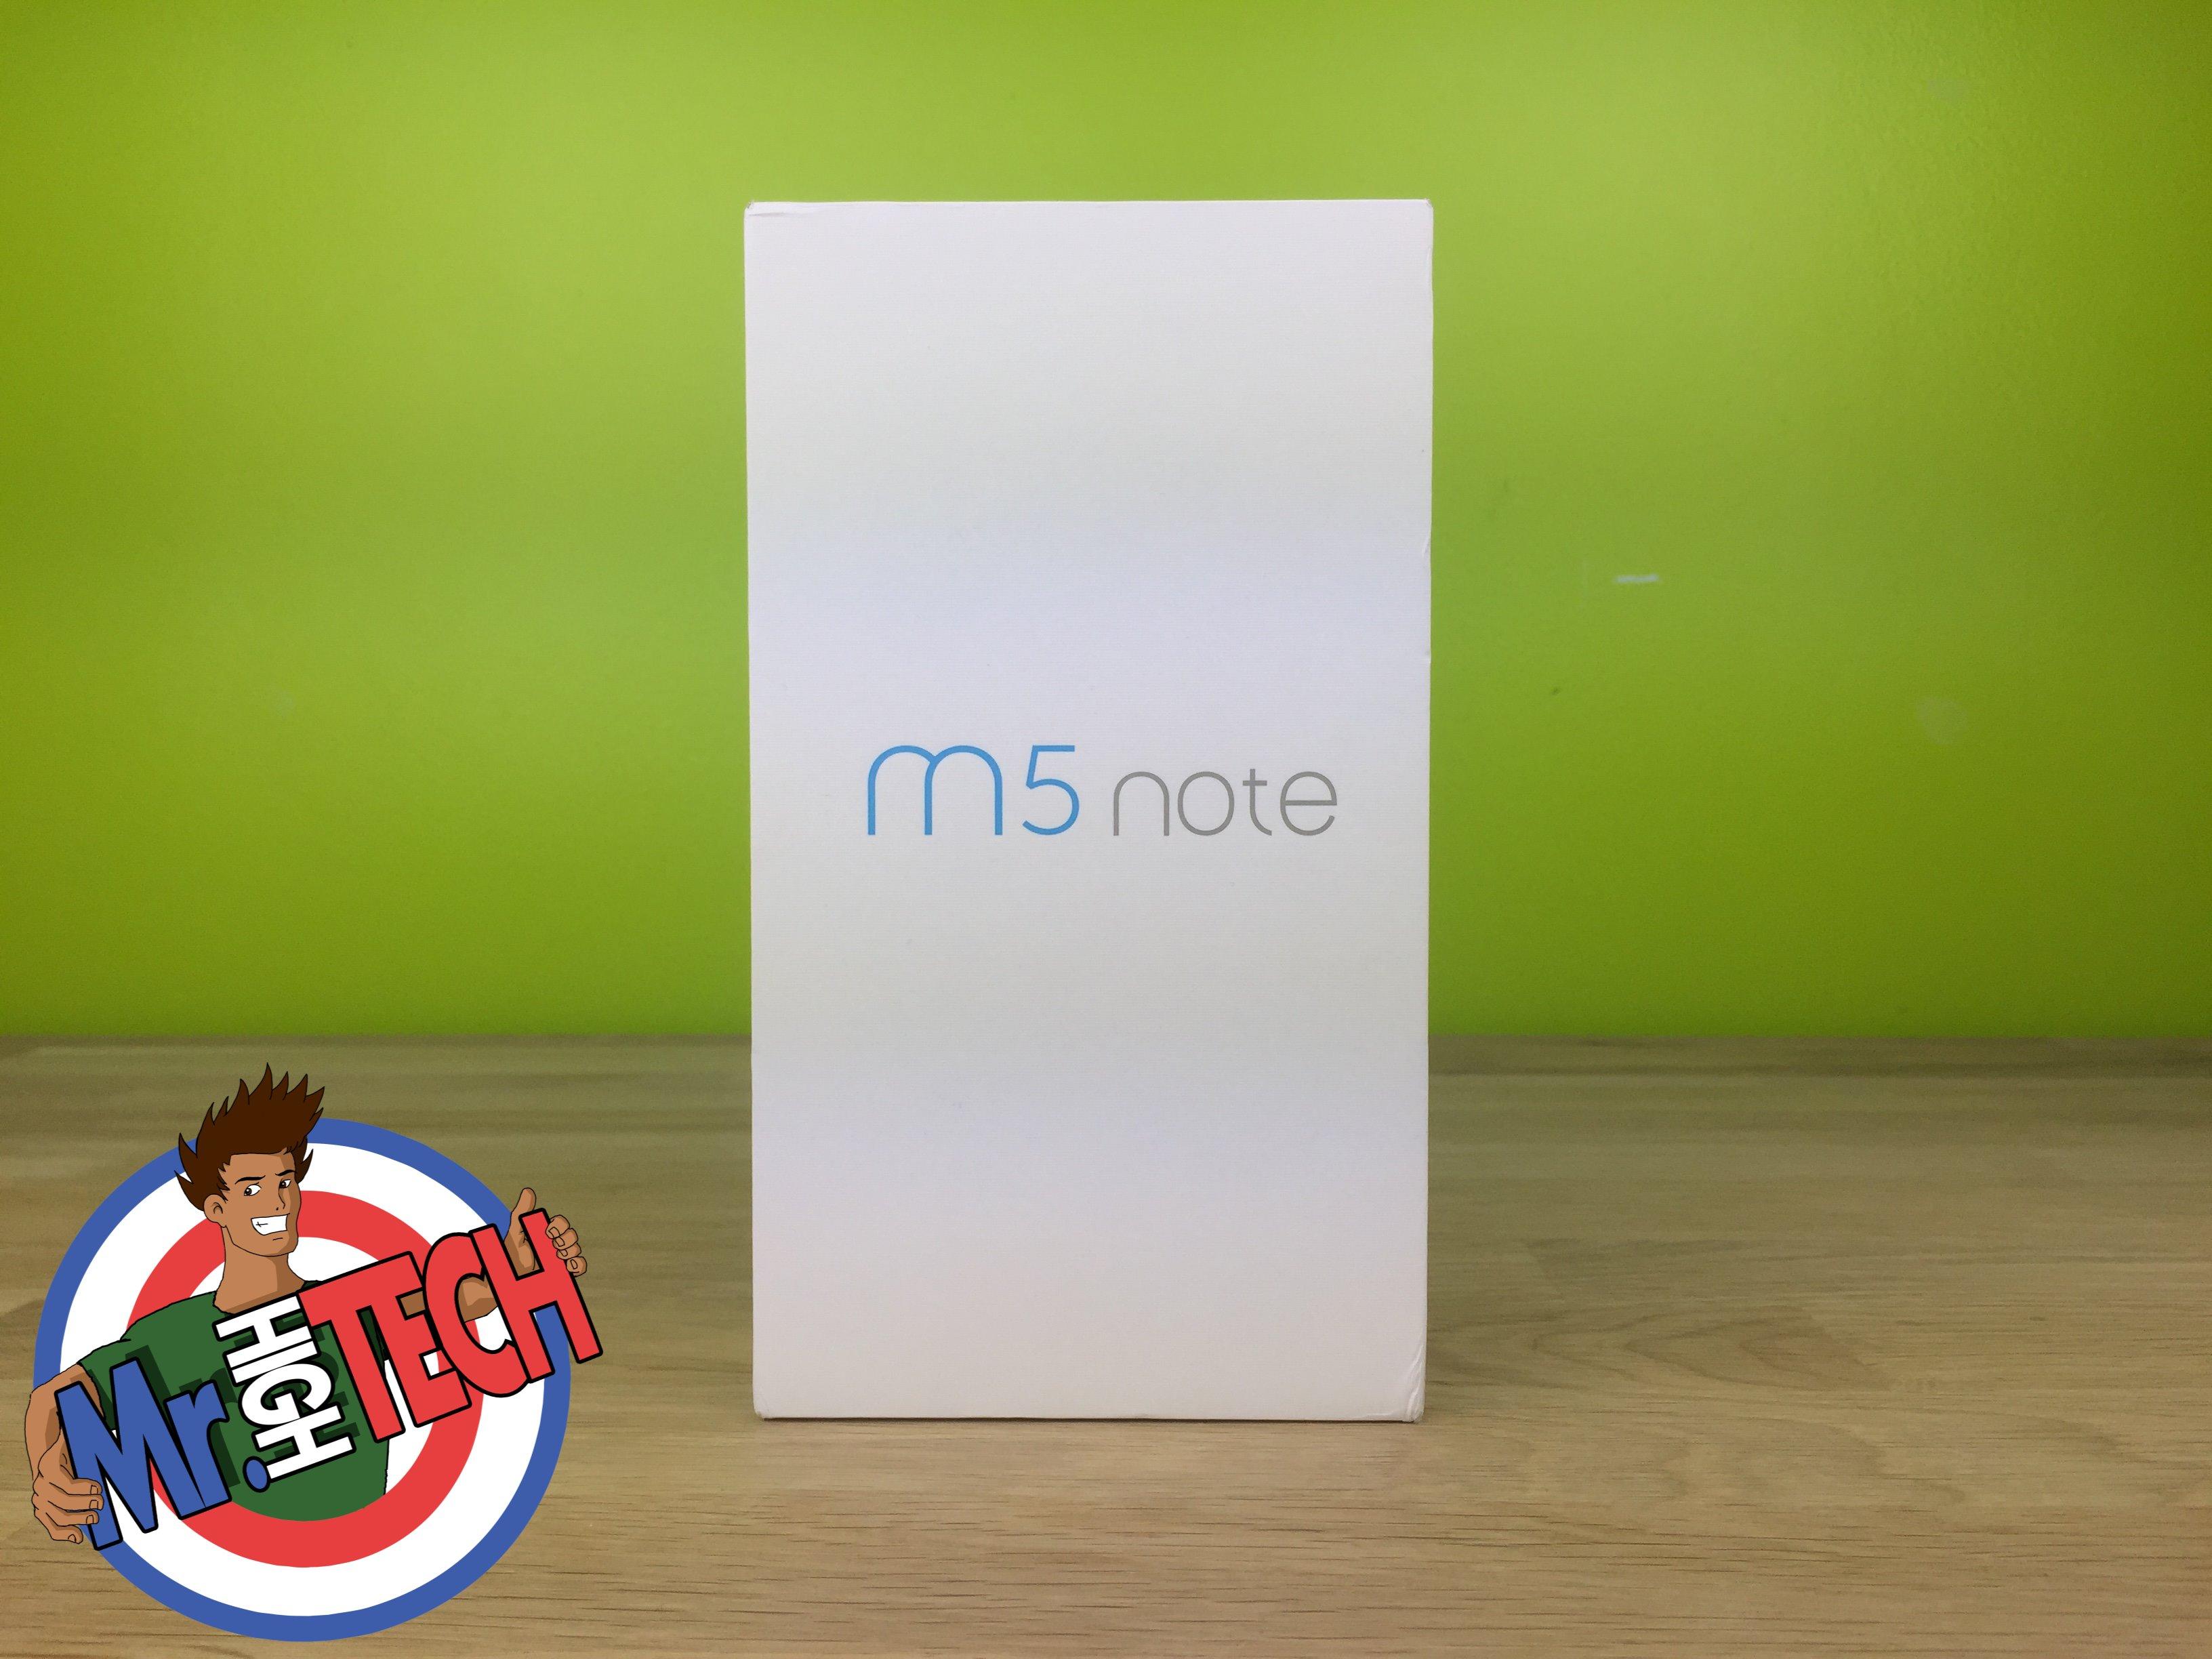 Carte De Lasie Test.Meizu M5 Note Test Du Smartphone Meizu Chinois Et Avis Complet